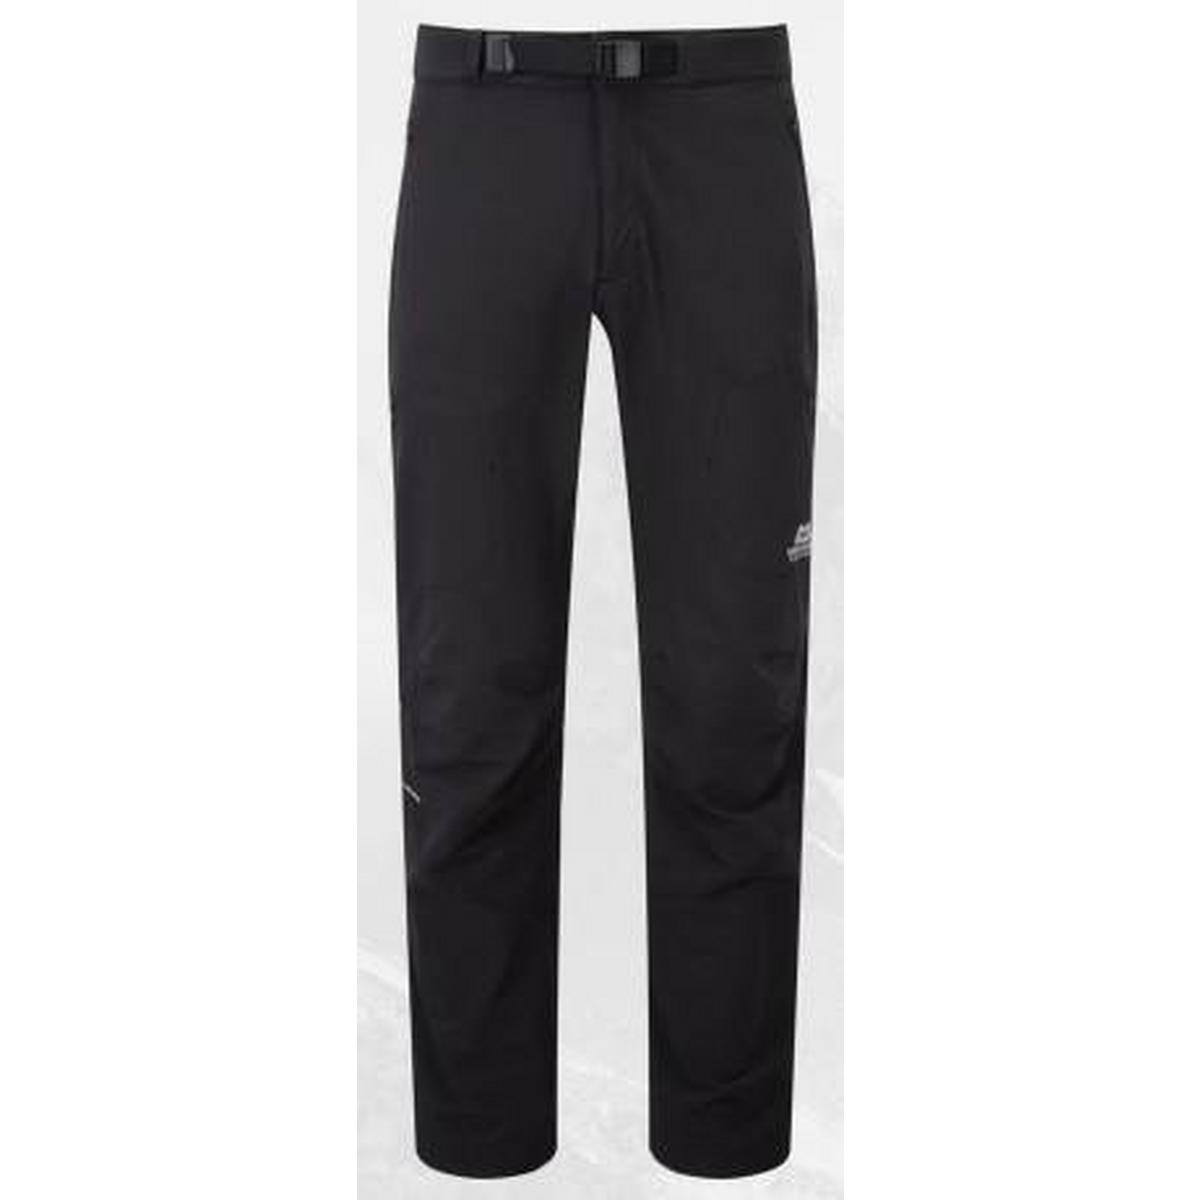 Mountain Equipment Men's Mountain Equipment Ibex Pant Short Leg - Black